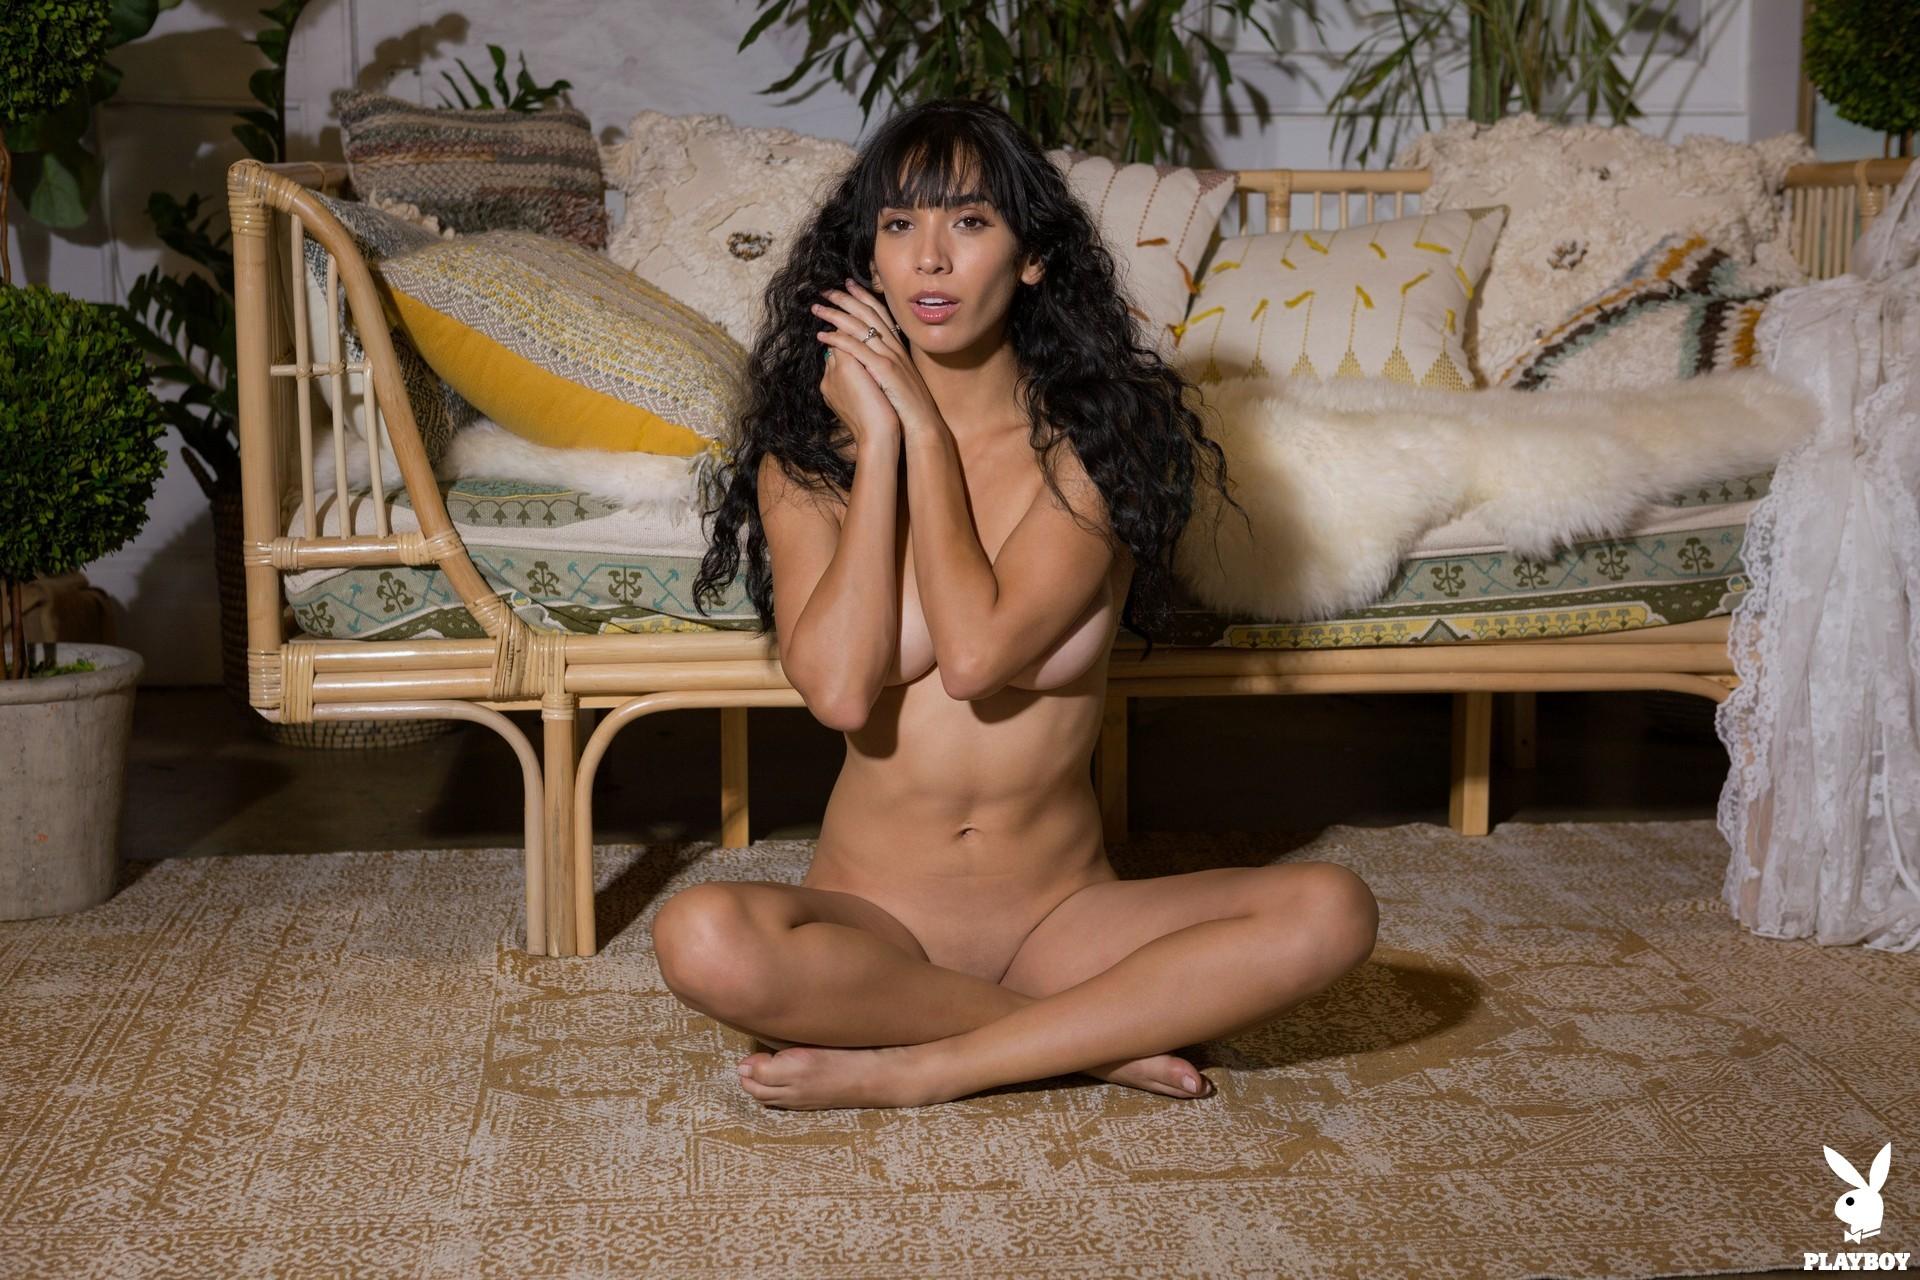 Erika De Leija in Perfect Daydream - Playboy Plus 29